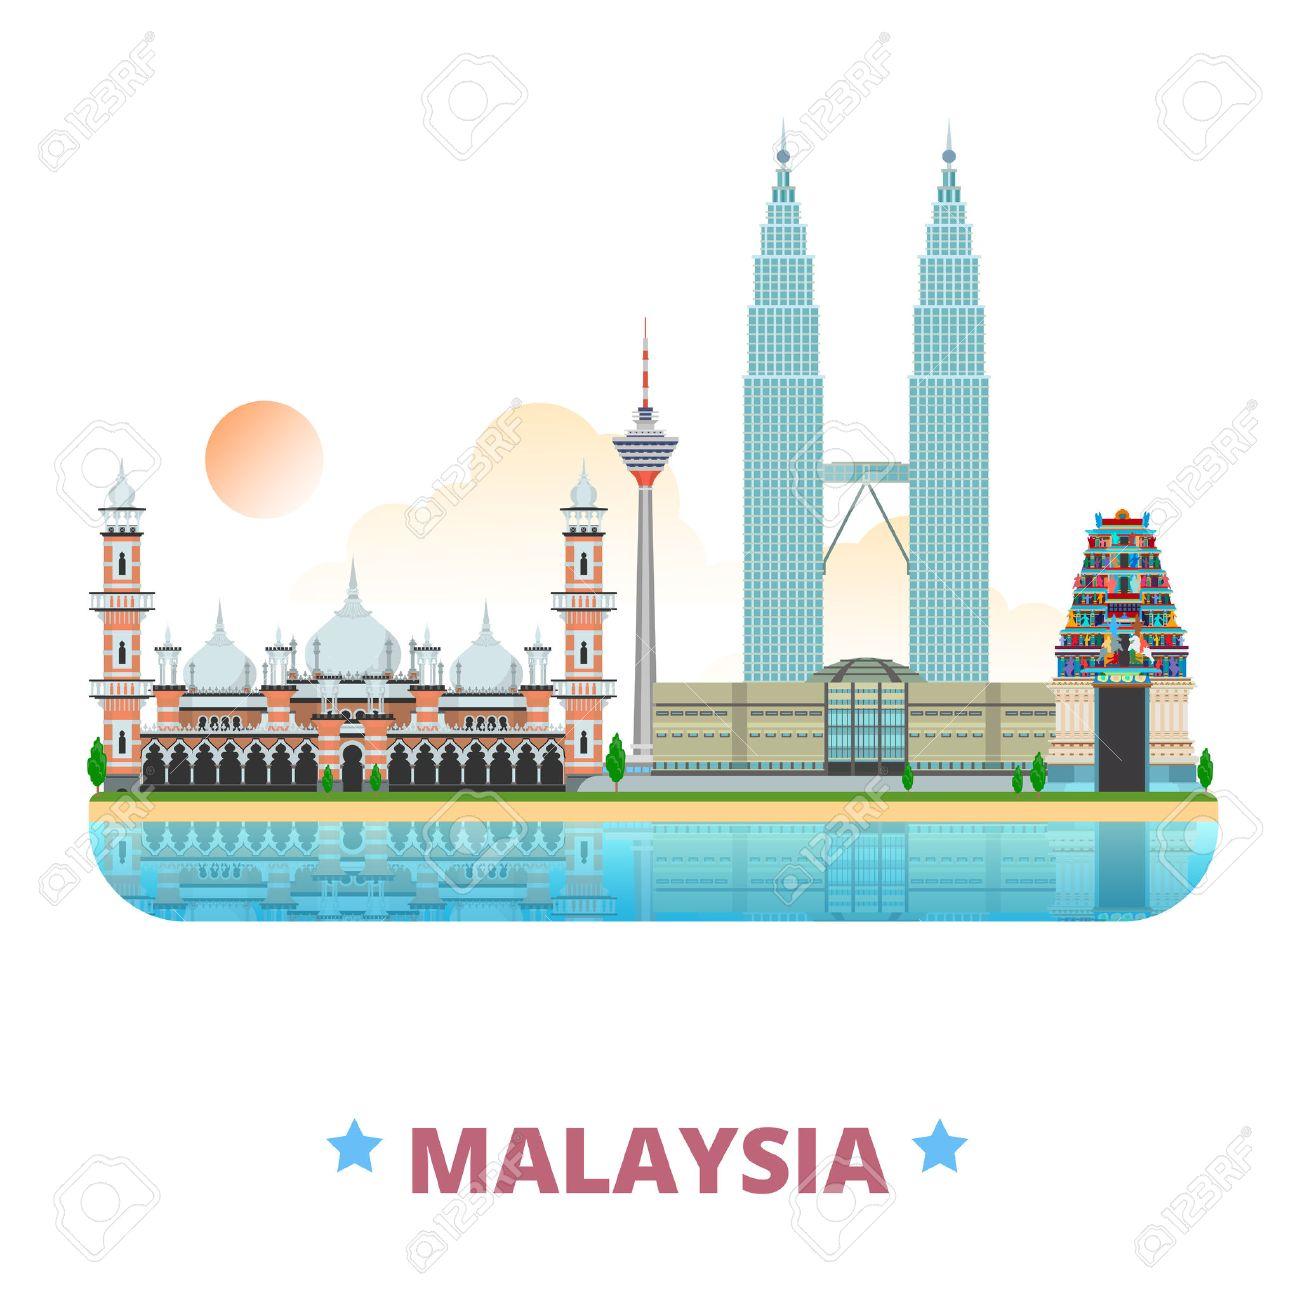 Malaysia country design template. Flat cartoon style historic sight web vector illustration. World travel Asia collection. Petronas Twin Sri Mahamariamman Hindu Temple Jamek Mosque Kuala Lumpur Tower. Stock Vector - 58835856